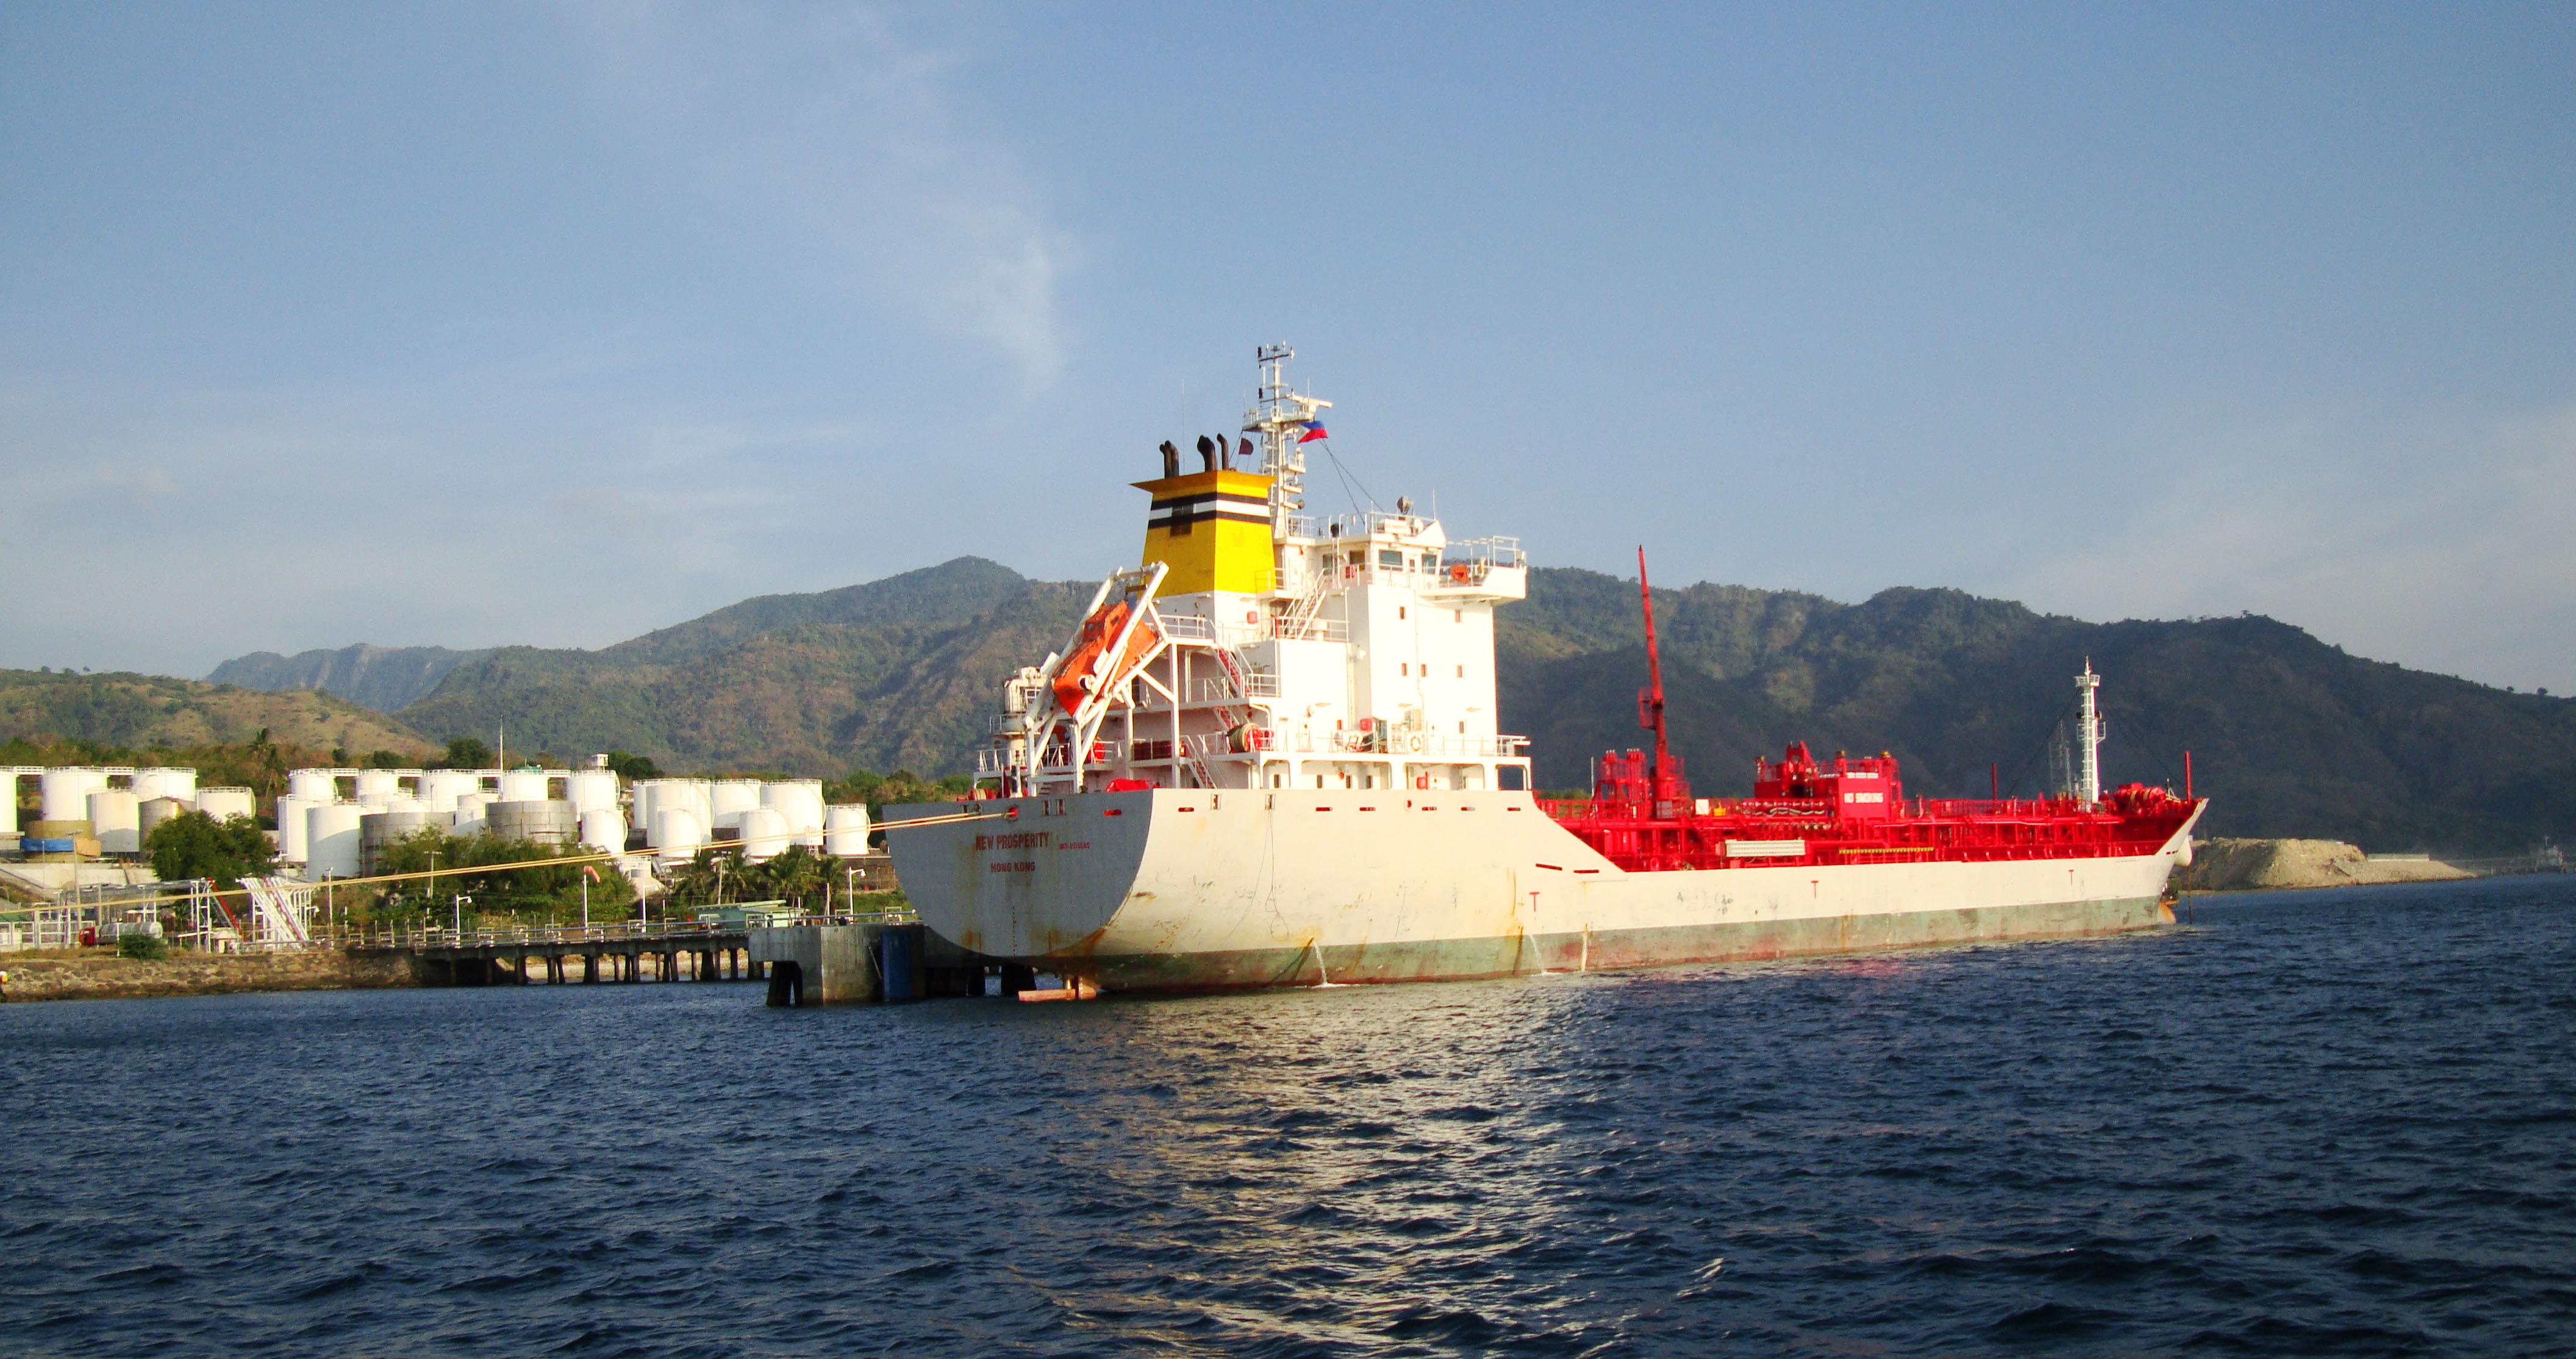 Hong Kong Merchant Vessel MV New Prosperity Batangus Bay Philippines 03